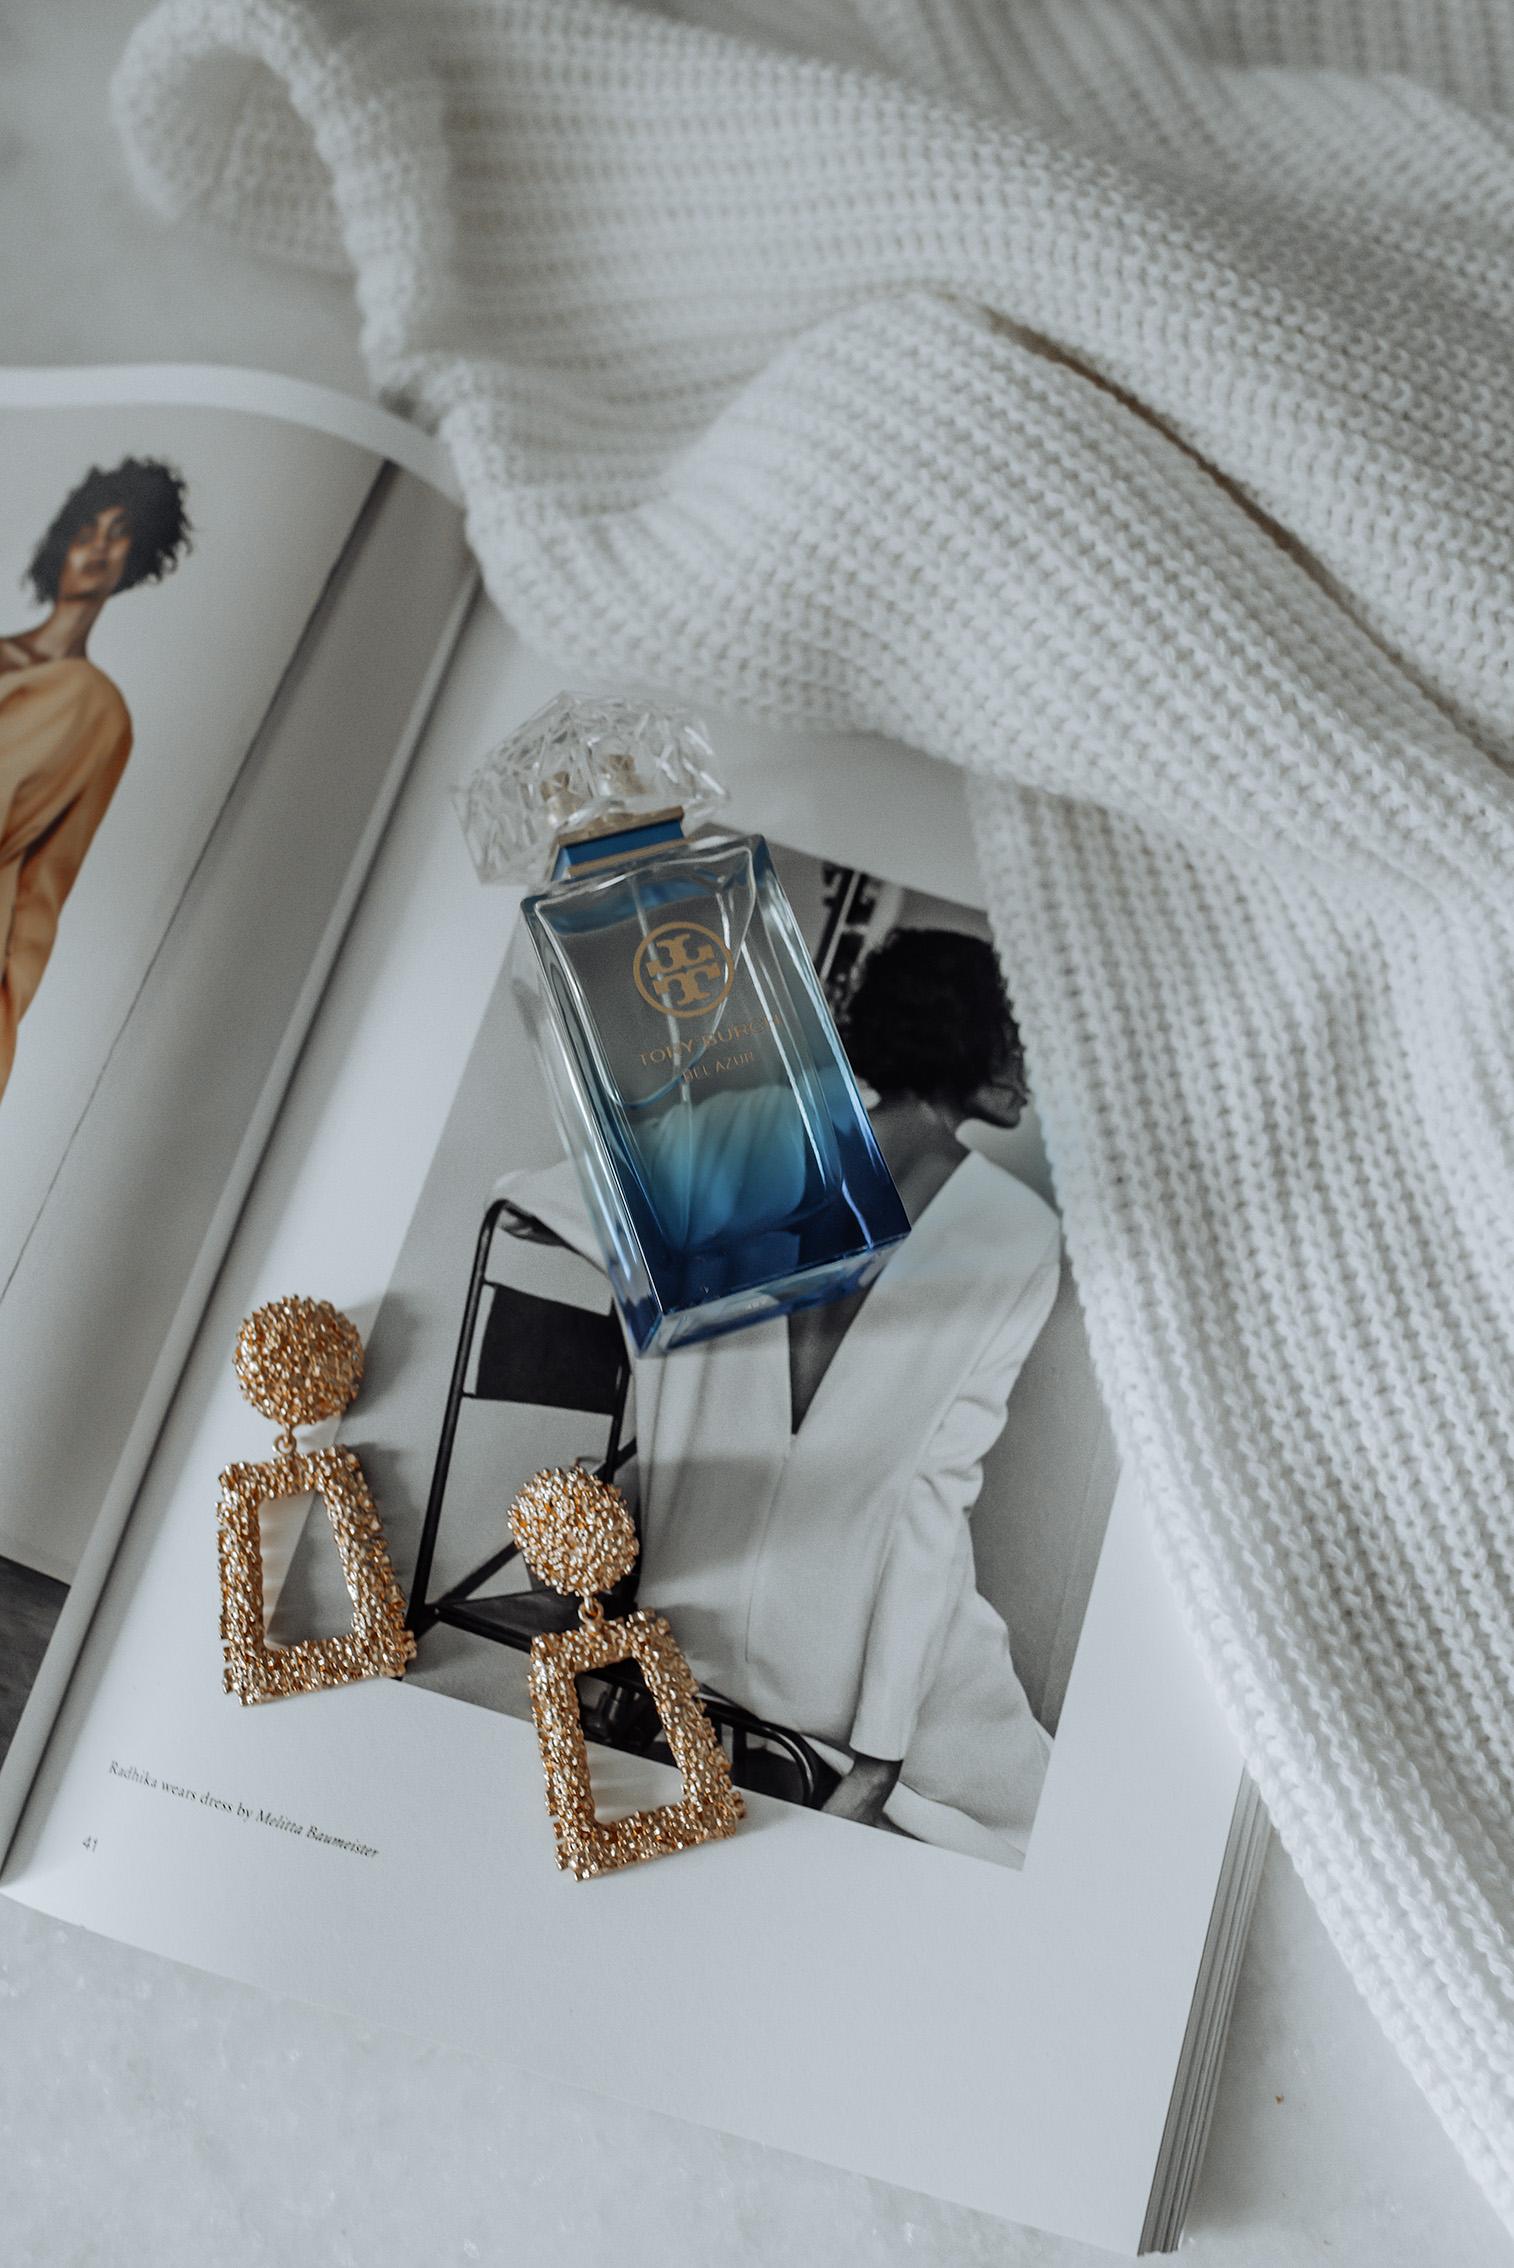 Bel Azur by Tory Burch | #beautyblogger #liketkit #style